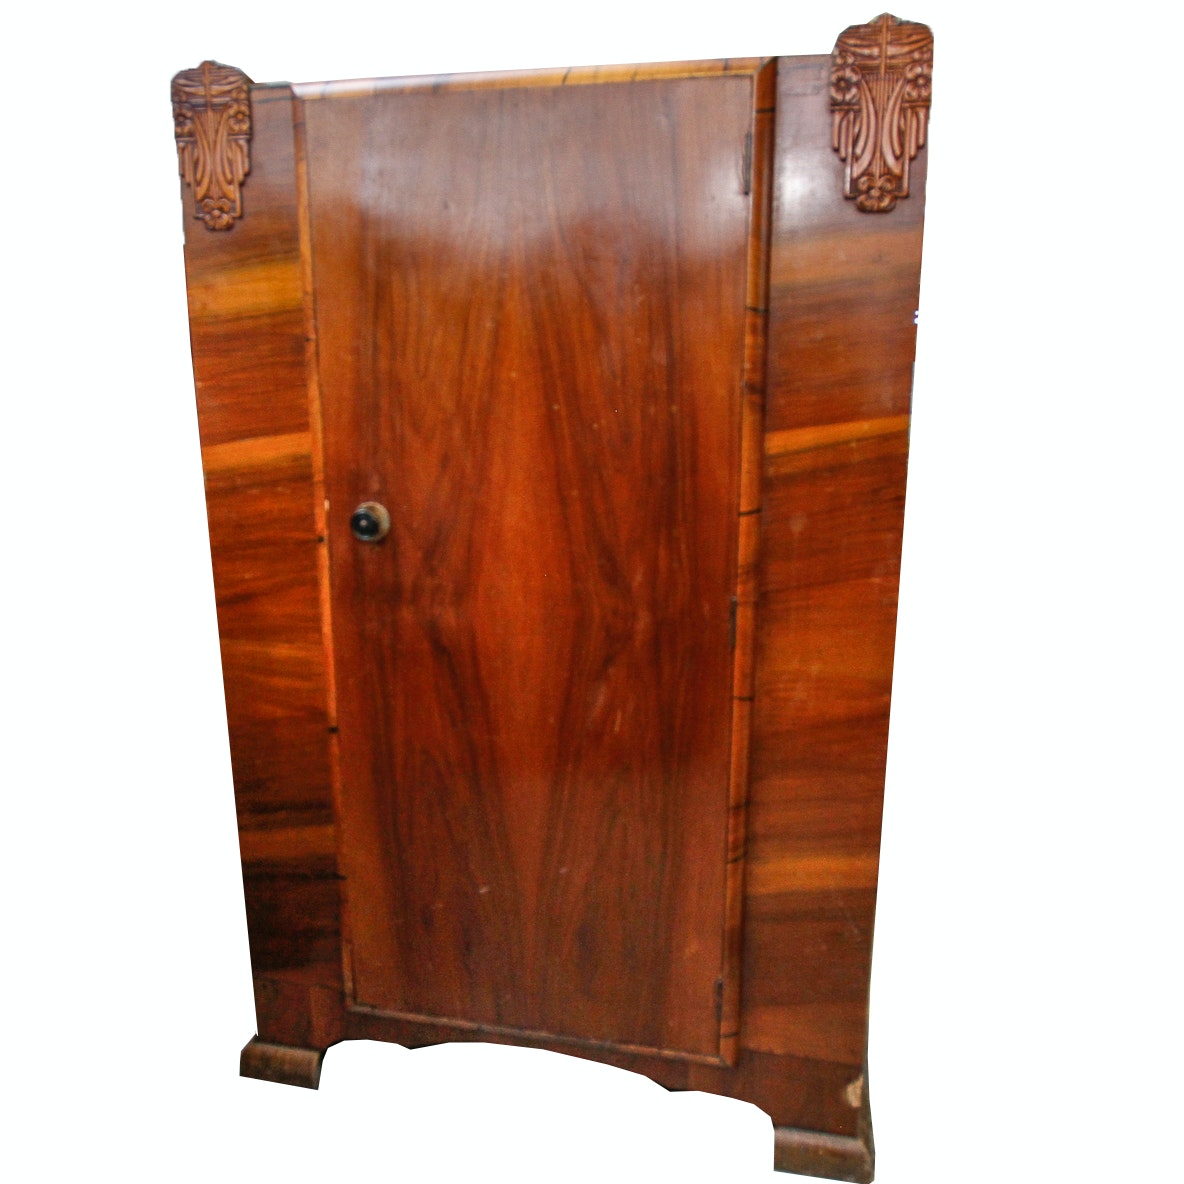 Vintage Art Deco Style Wardrobe Cabinet